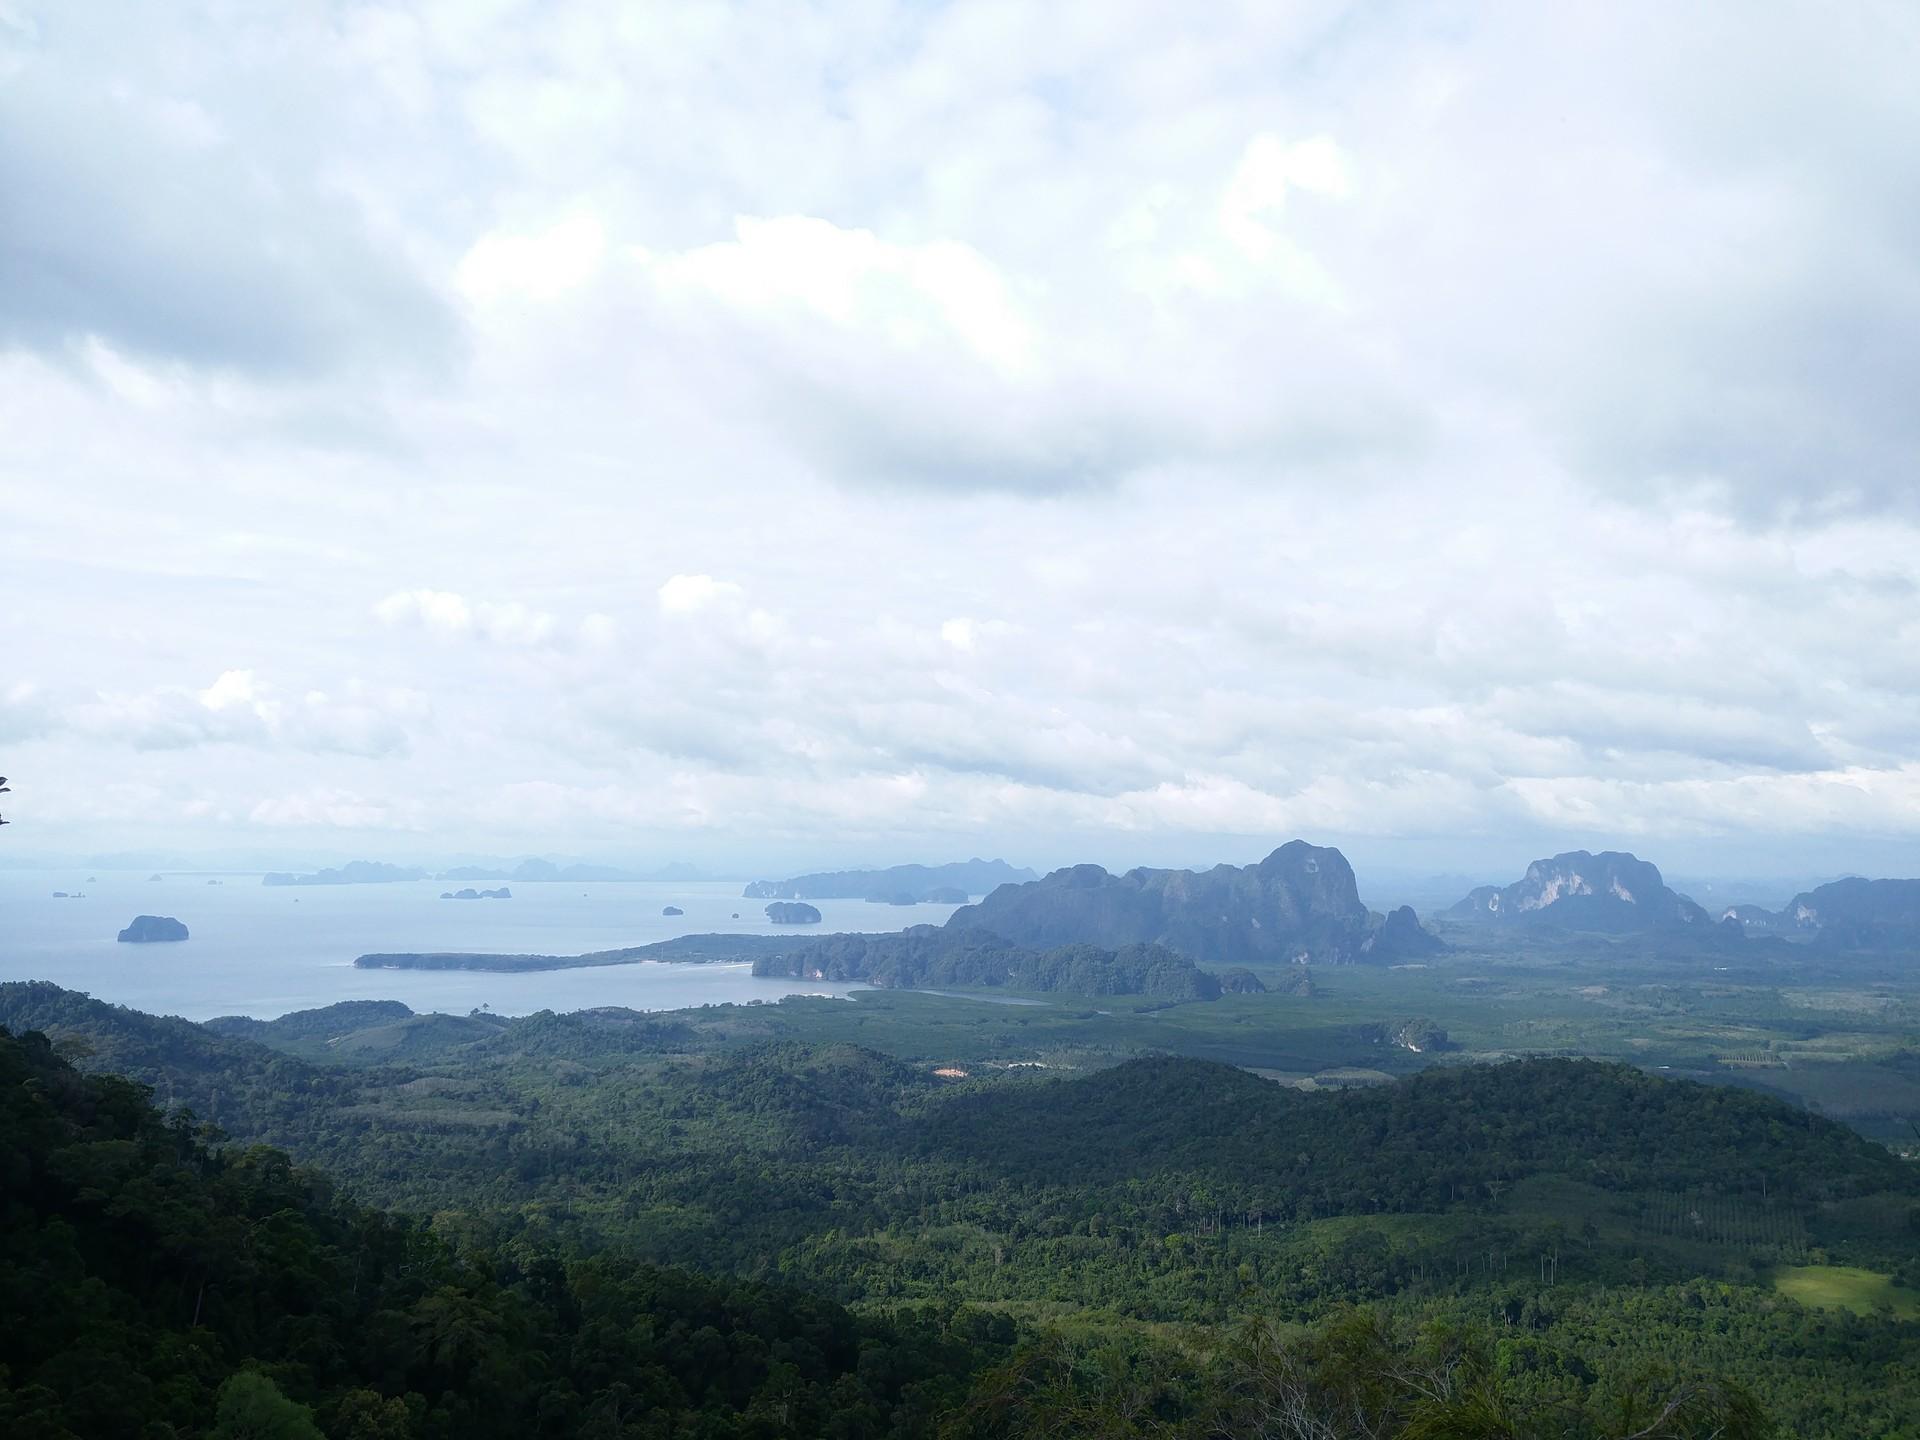 hiking-dragon-crest-mountain-trail-24183